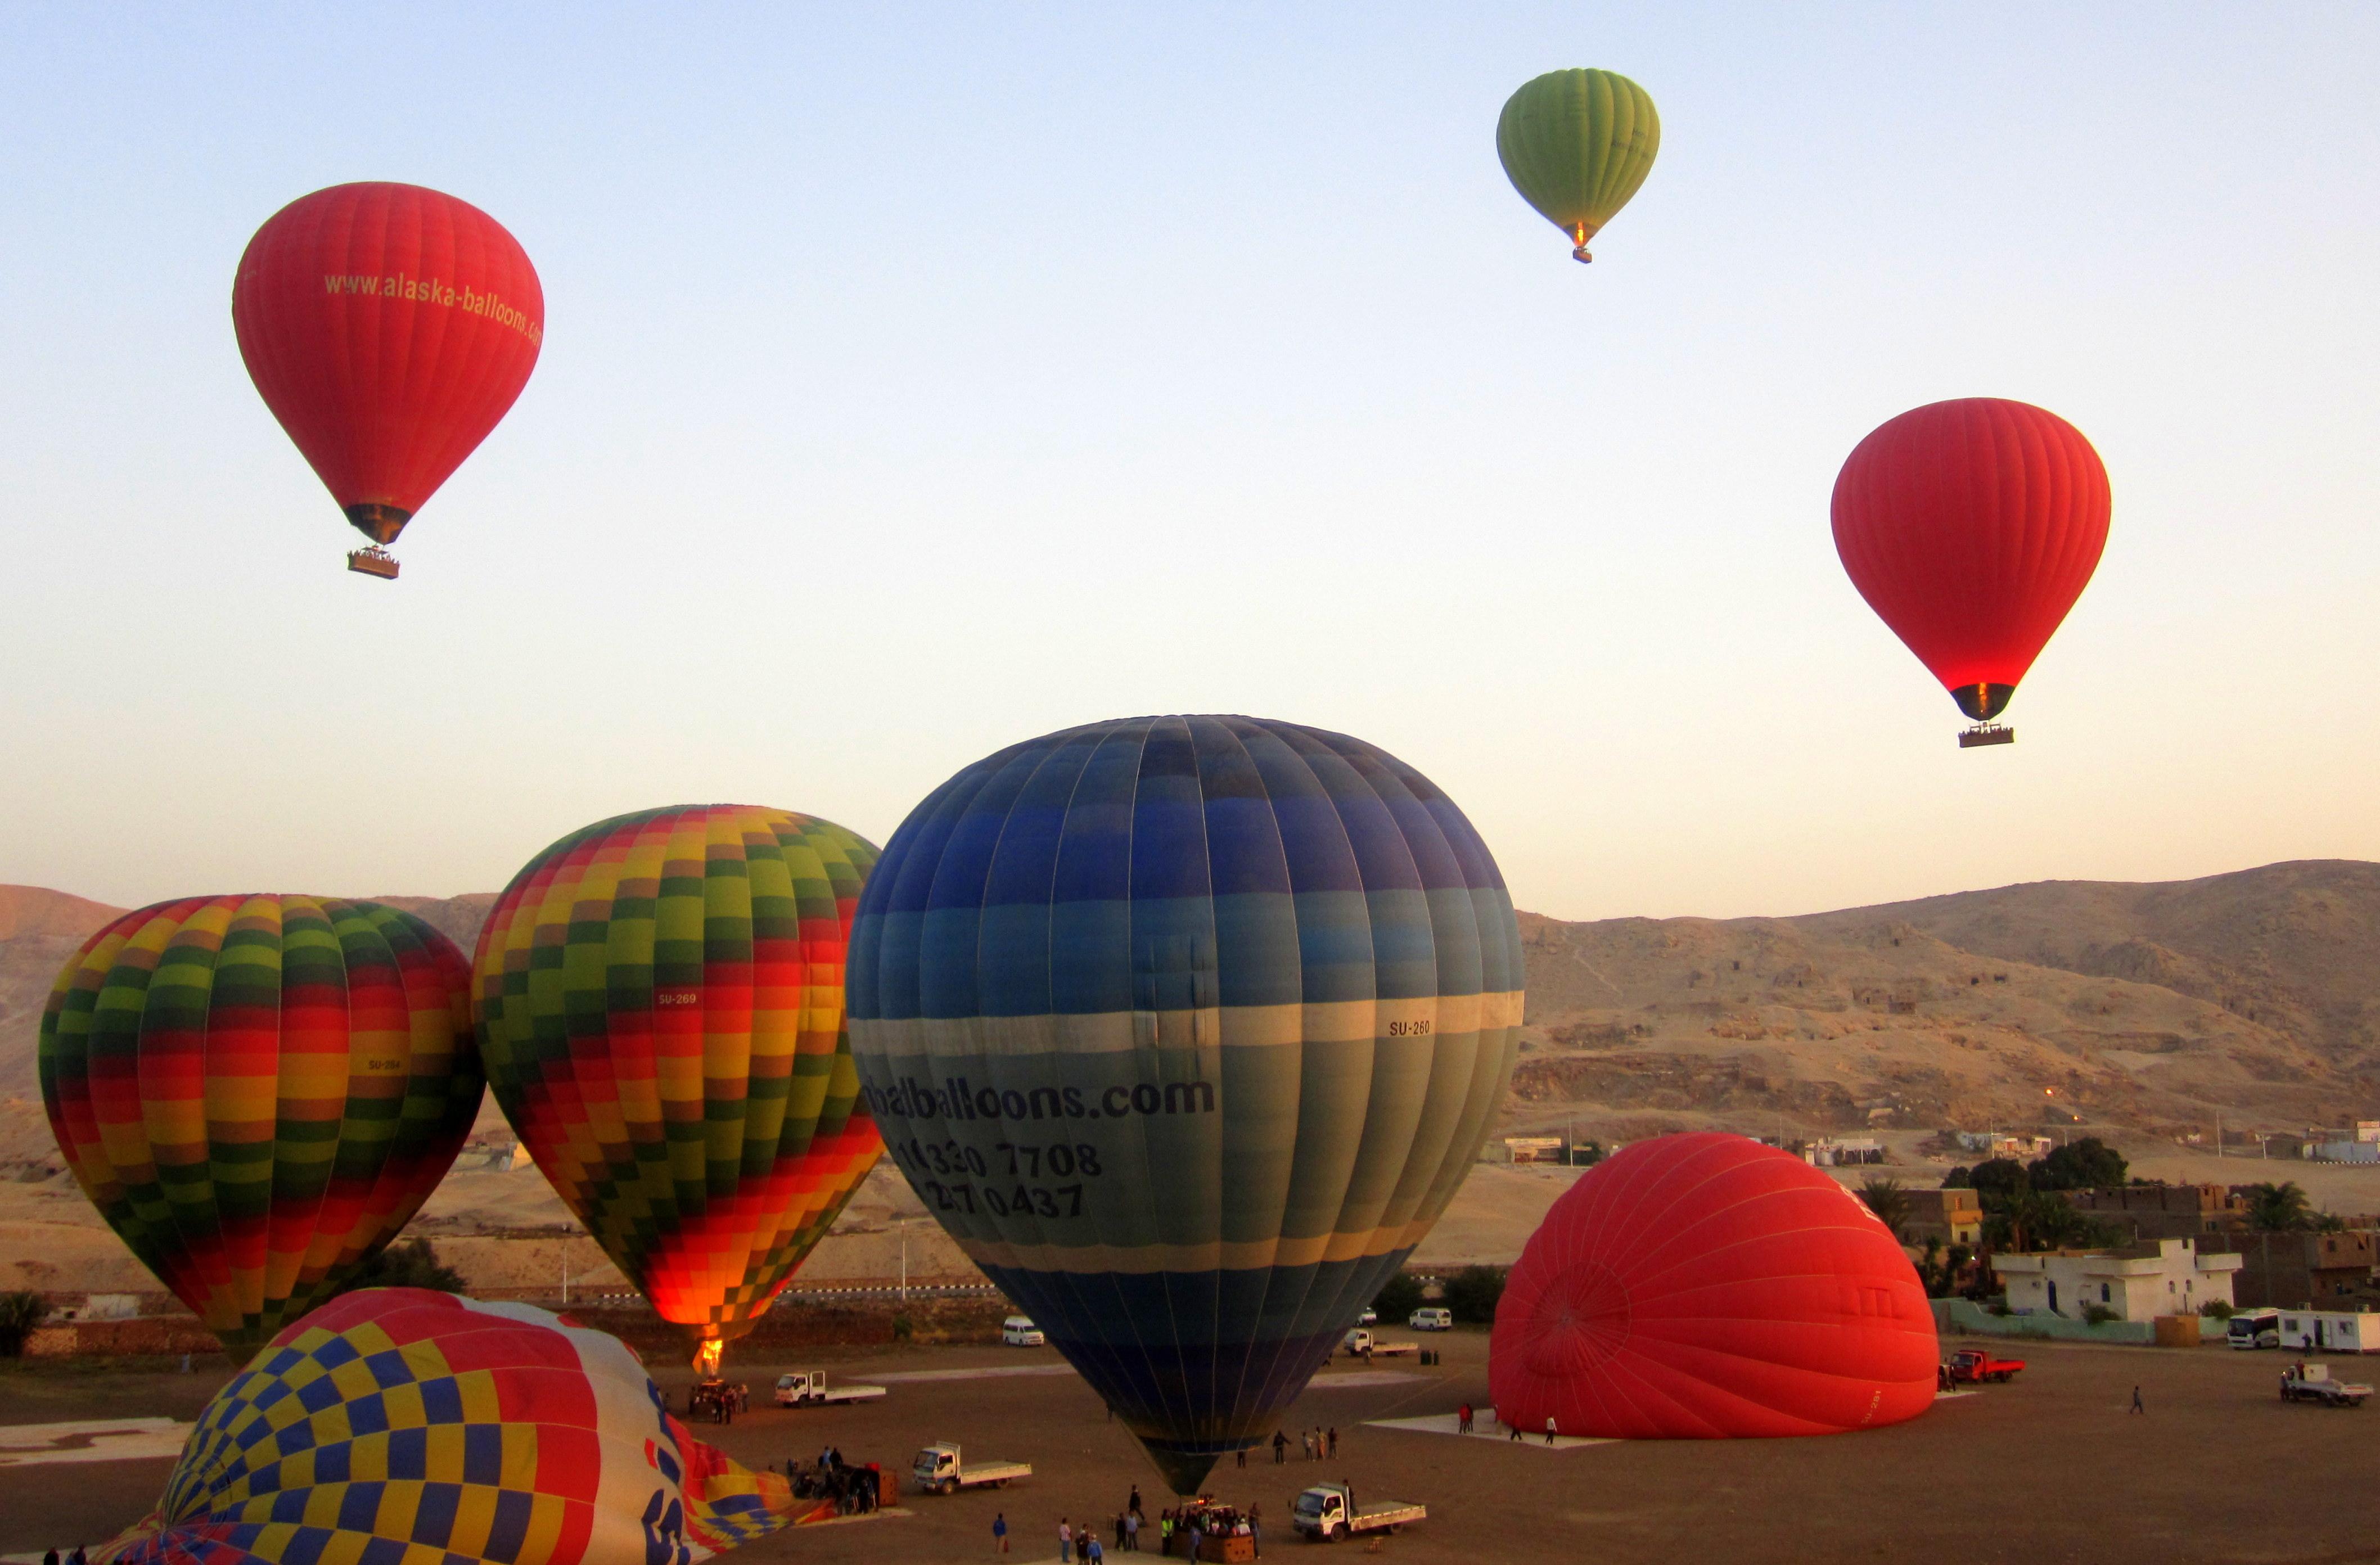 #egypt #egypttourism #rivernile #luxor #luxortourism #luxorhotairballooning